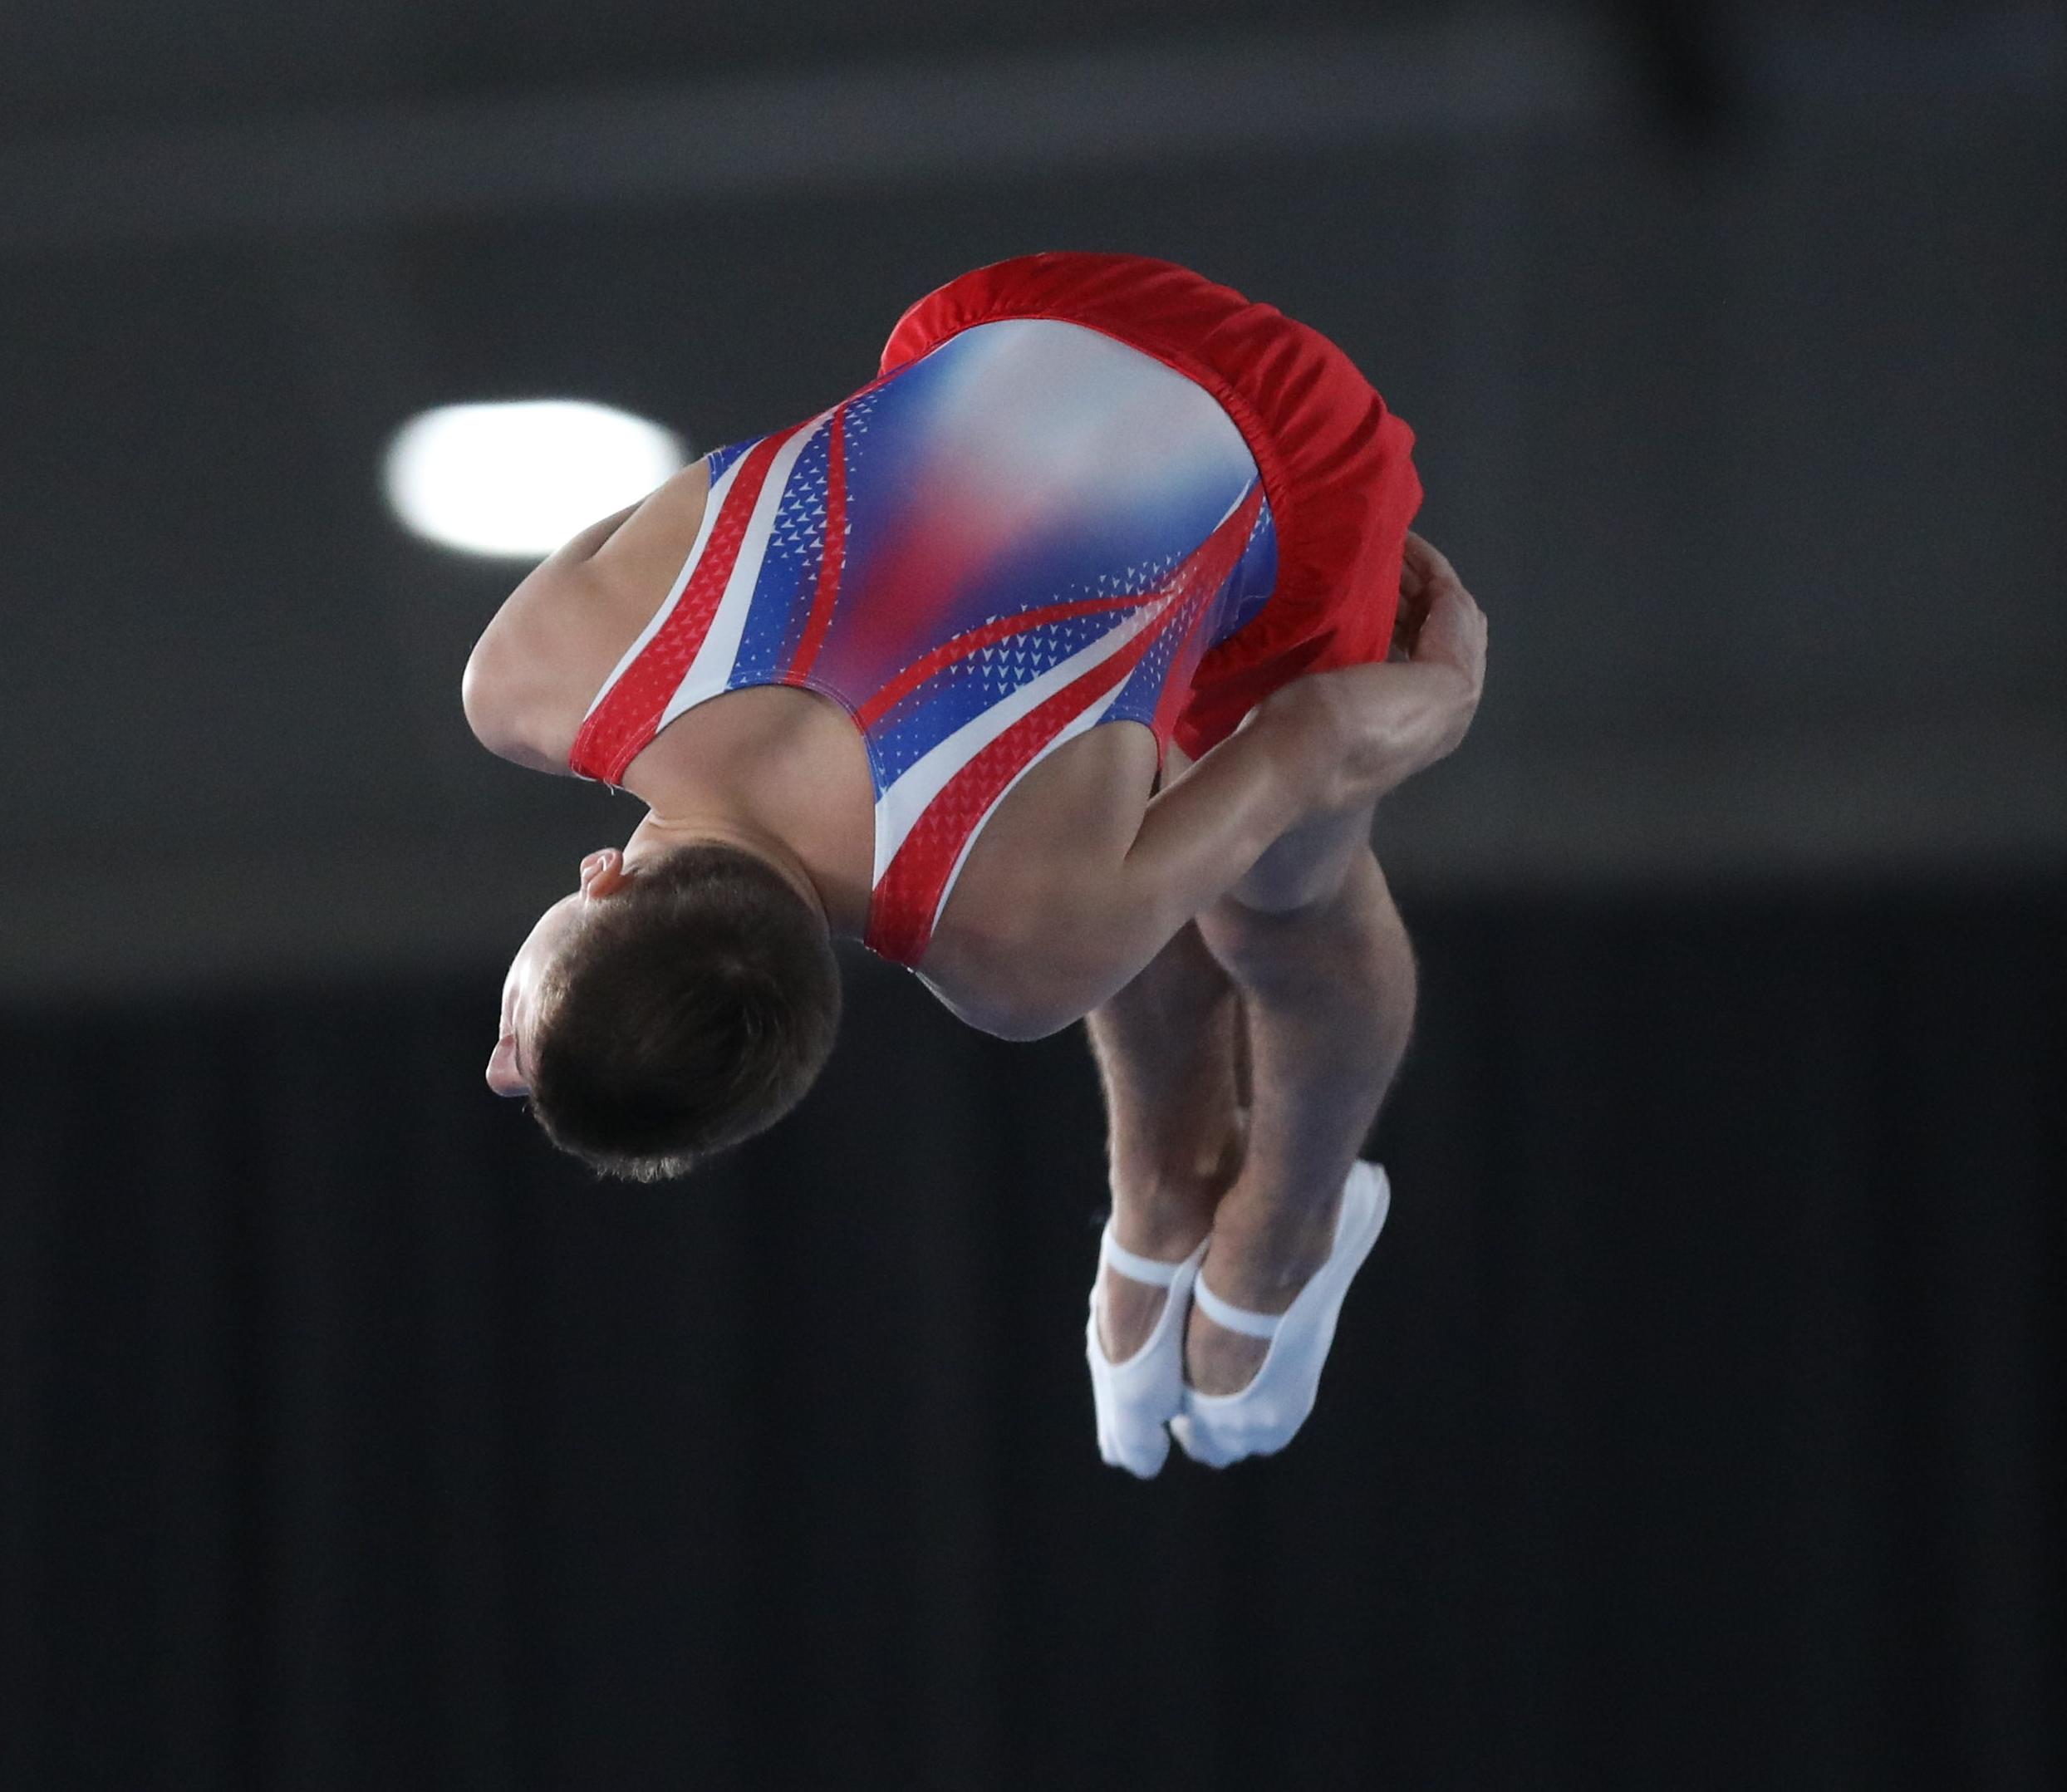 2018-10-14 Boys' Trampoline Gymnastics Final at 2018 Summer Youth Olympics by Sandro Halank-267.jpg Deutsch: Trampolinturnen männlich: Finale